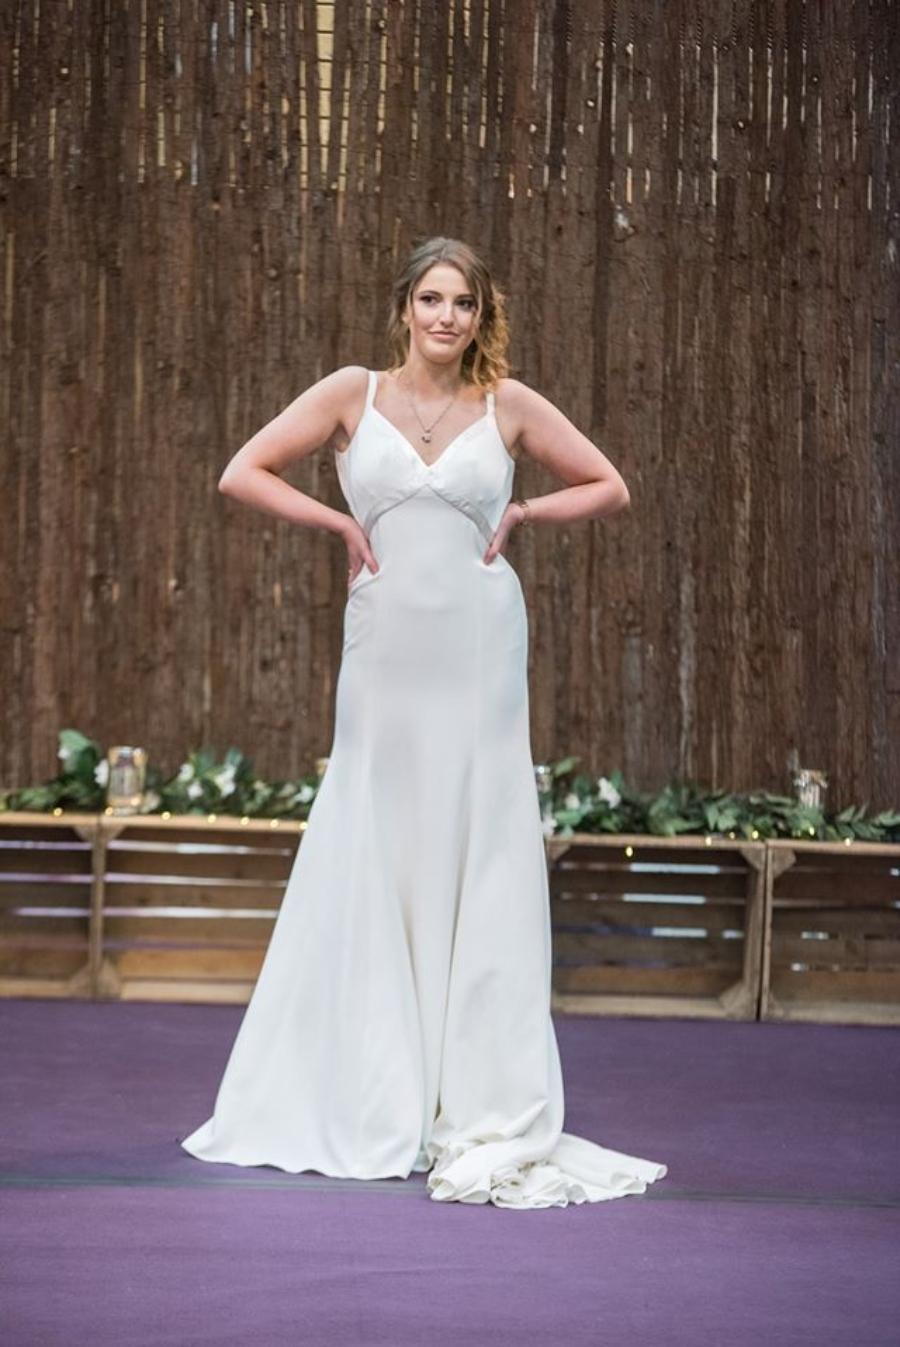 Bridal Fashion Show with The Wedding Scene